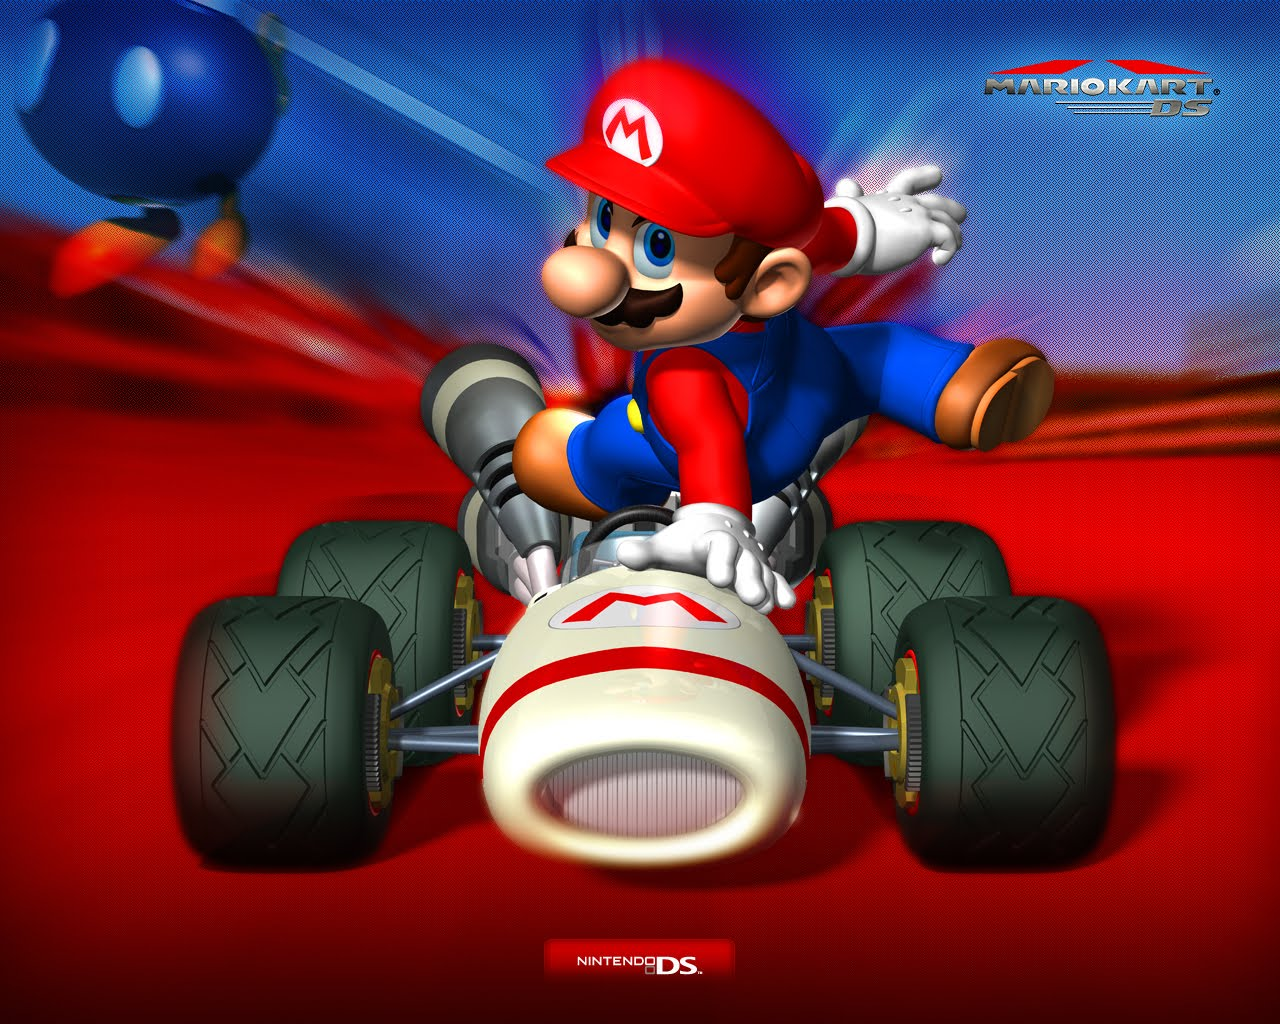 http://4.bp.blogspot.com/__nDs0Ugs8c8/TTZ0oxqMxbI/AAAAAAAAAX8/i4Frut6psco/s1600/Mario-Kart-Wallpaper-super-mario-bros-5313947-1280-1024.jpg